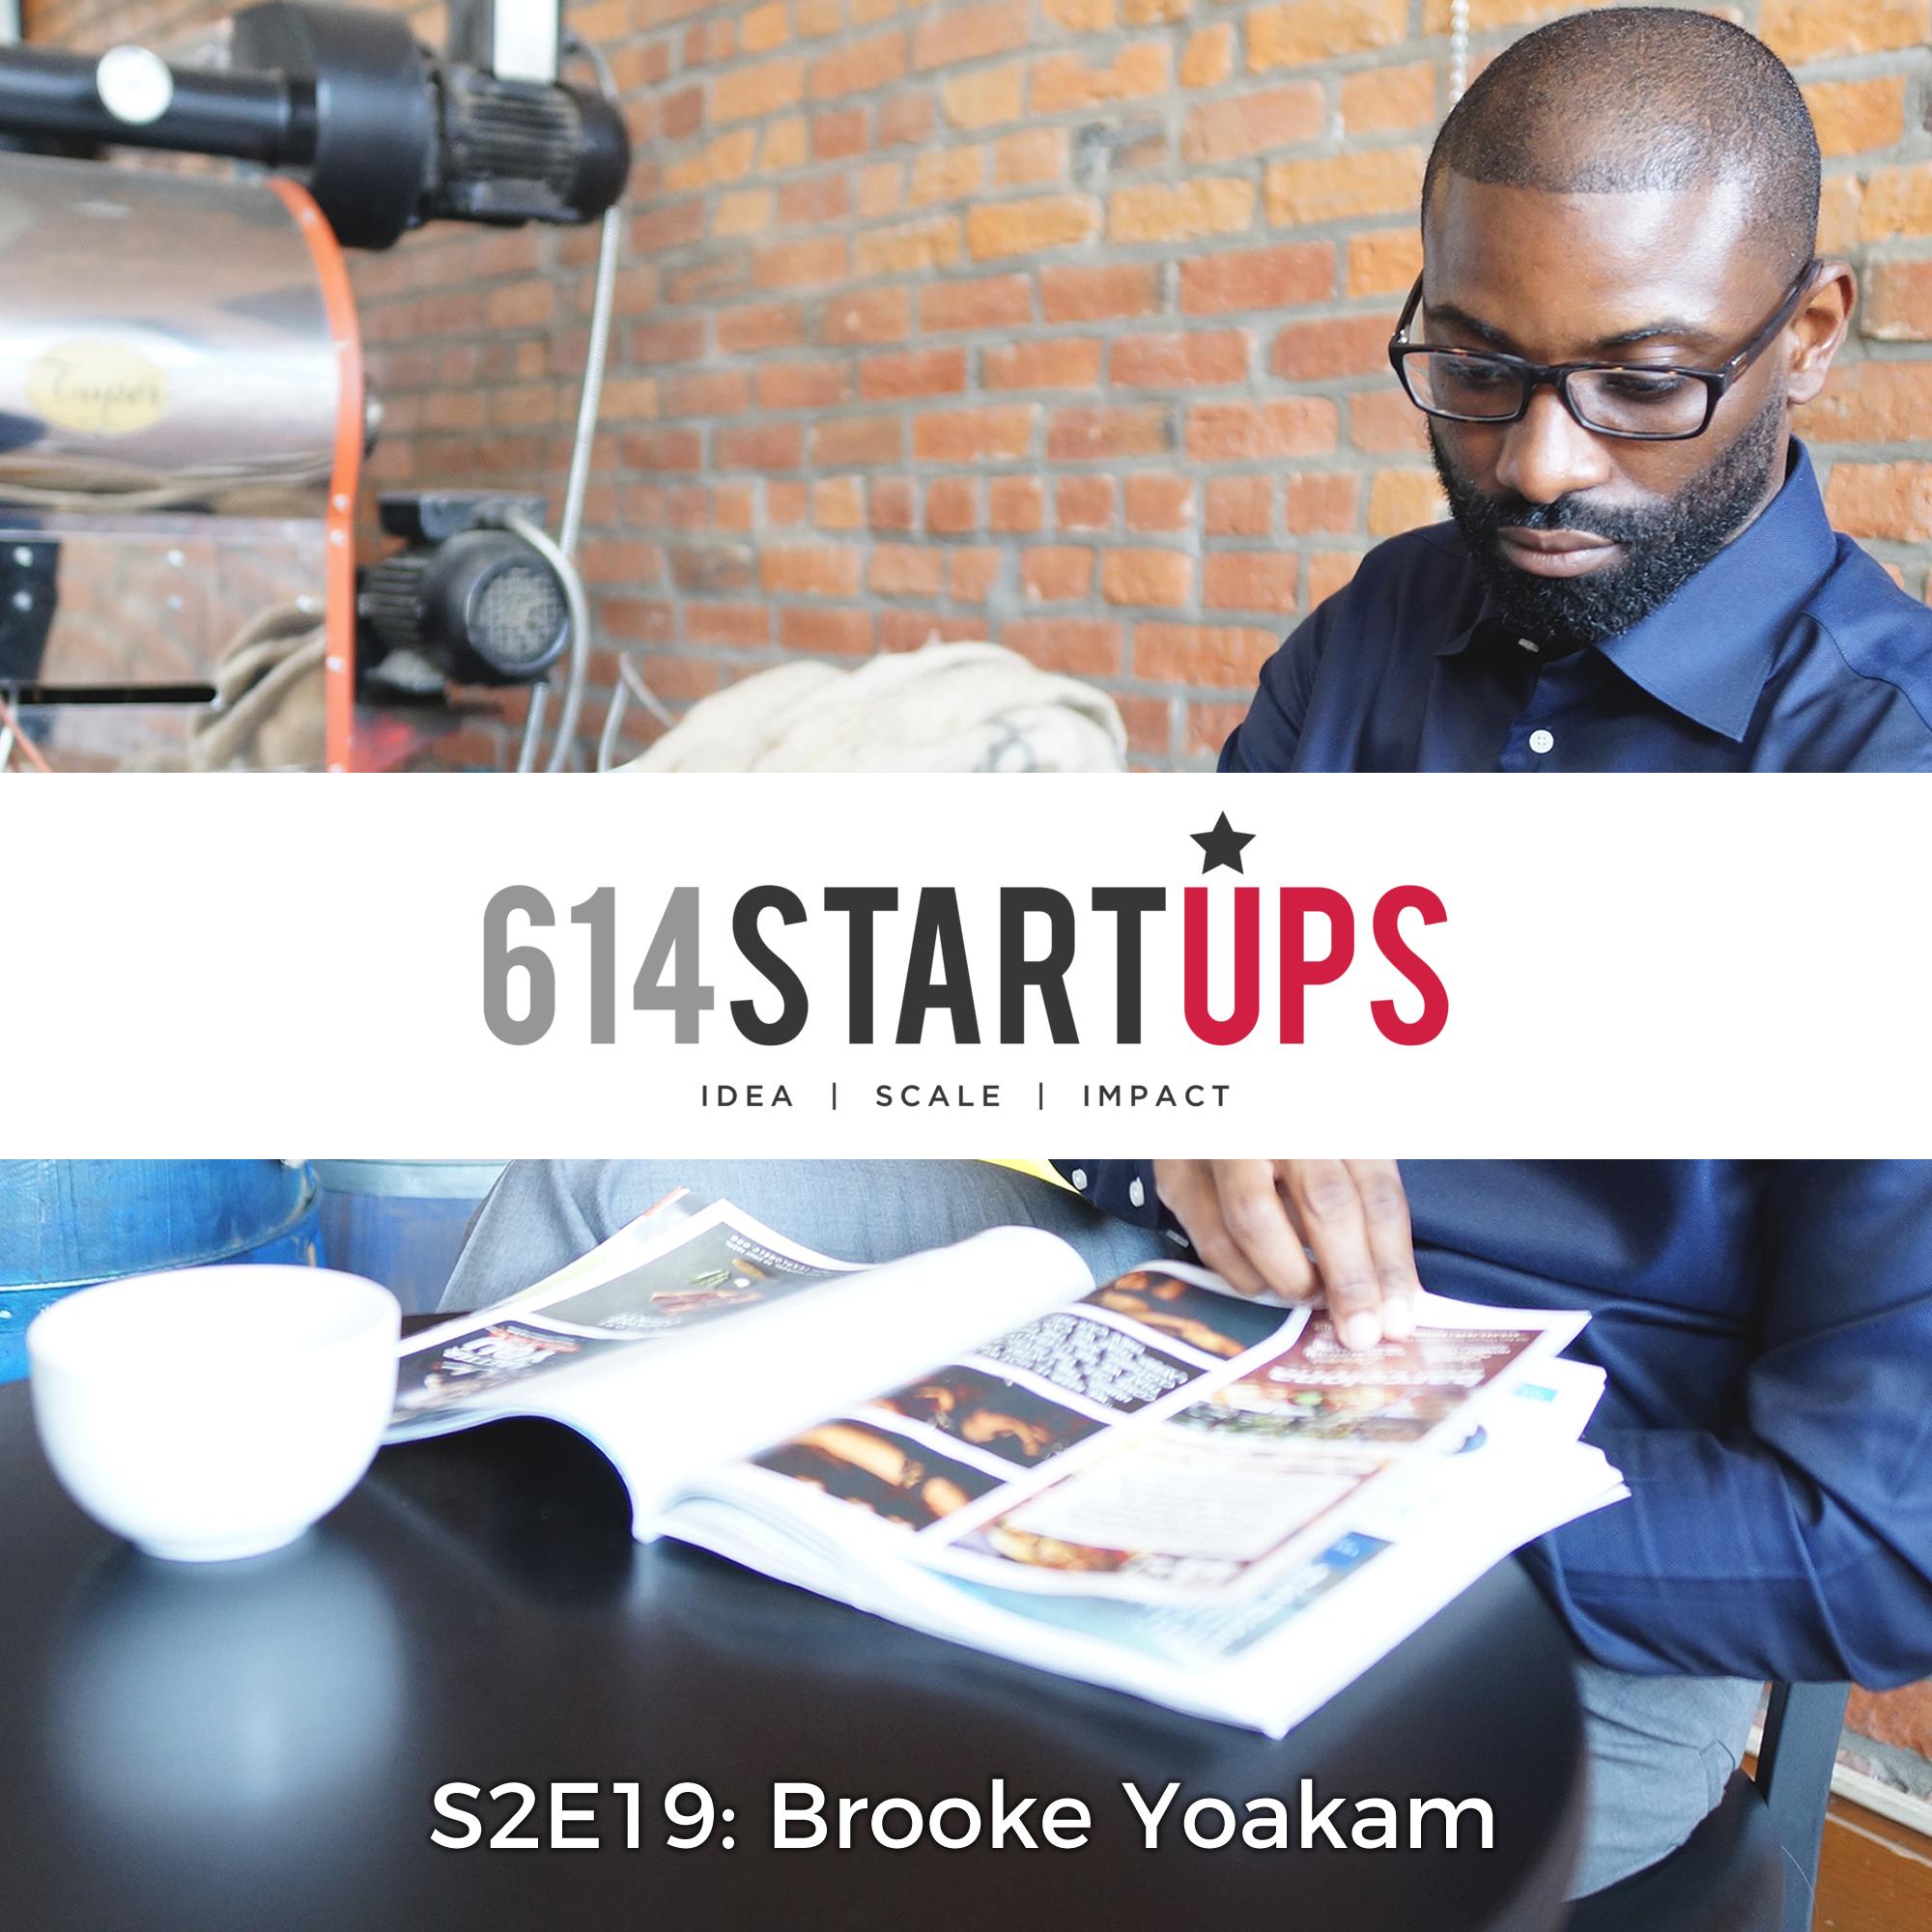 614SU - S2E19 - Brooke Yoakam.jpg